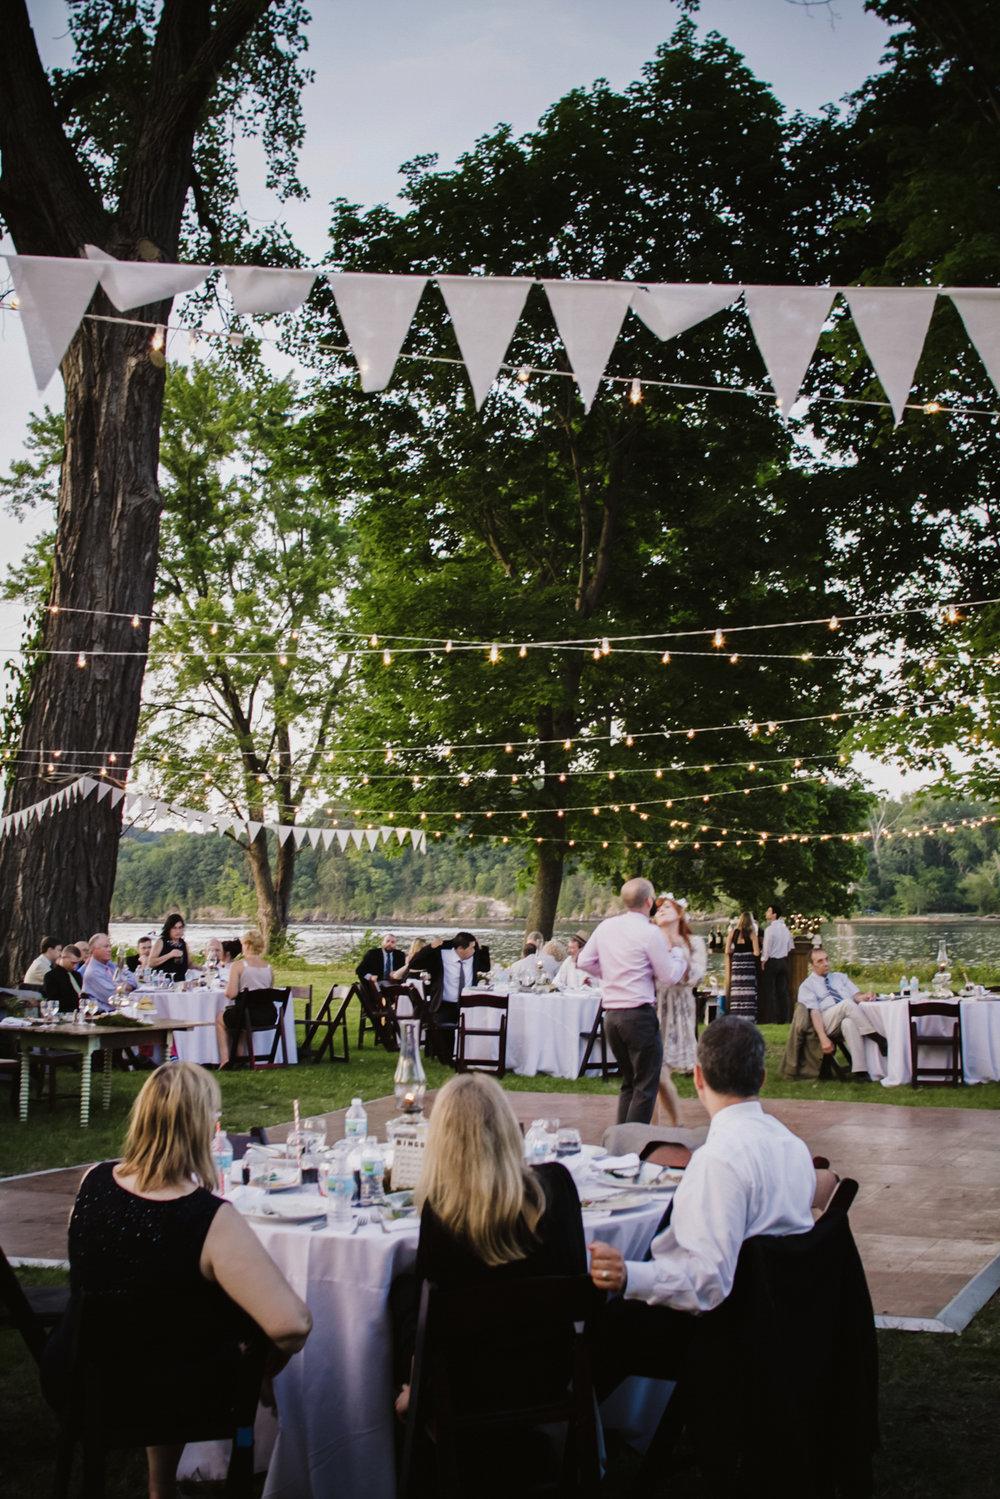 Kimberly-Coccagnia-Wedding-Photographer-261.JPG